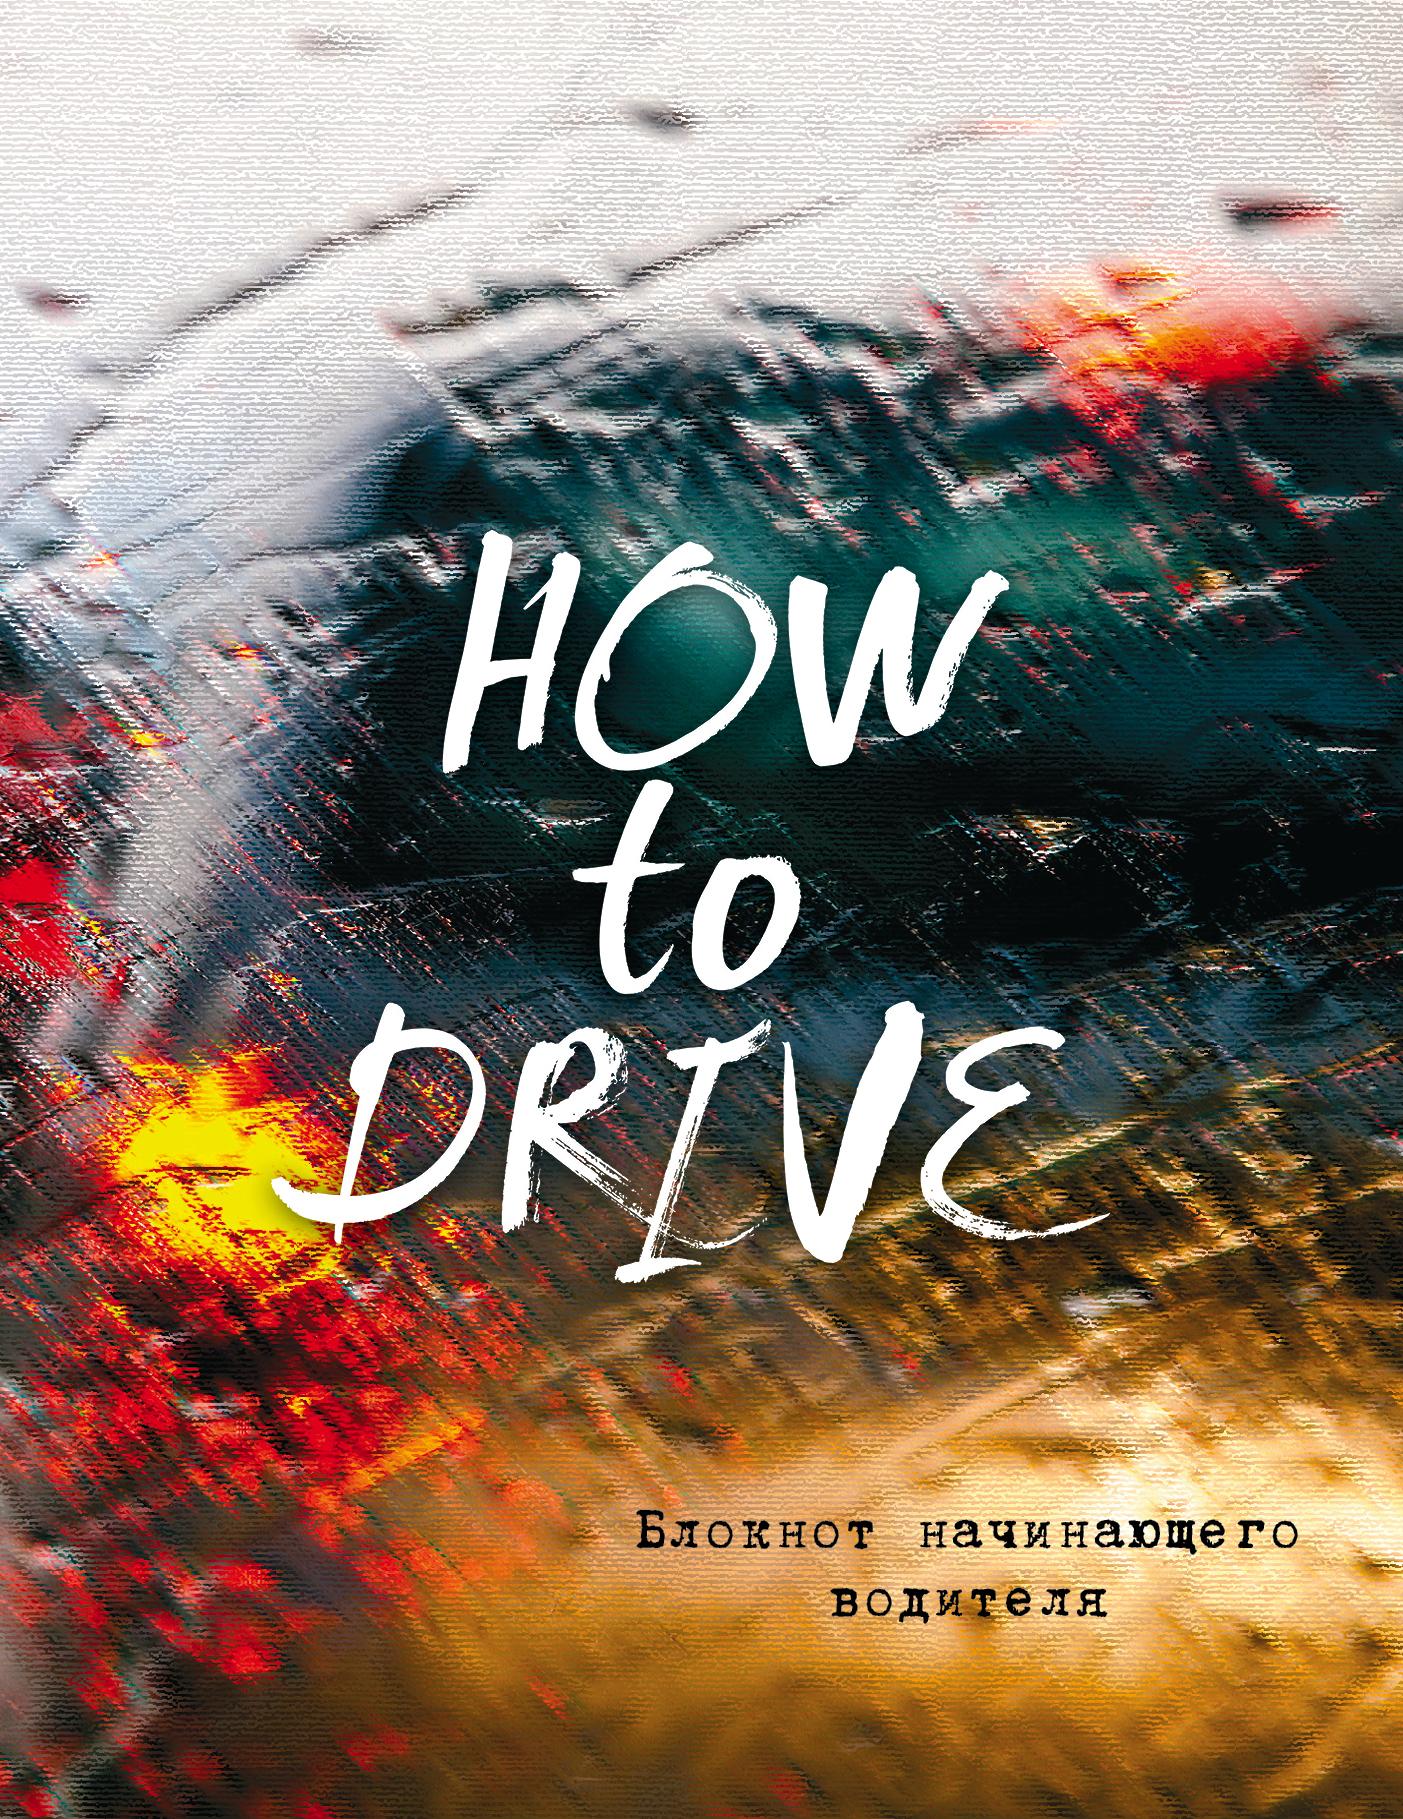 Блокнот начинающего водителя (How to drive)